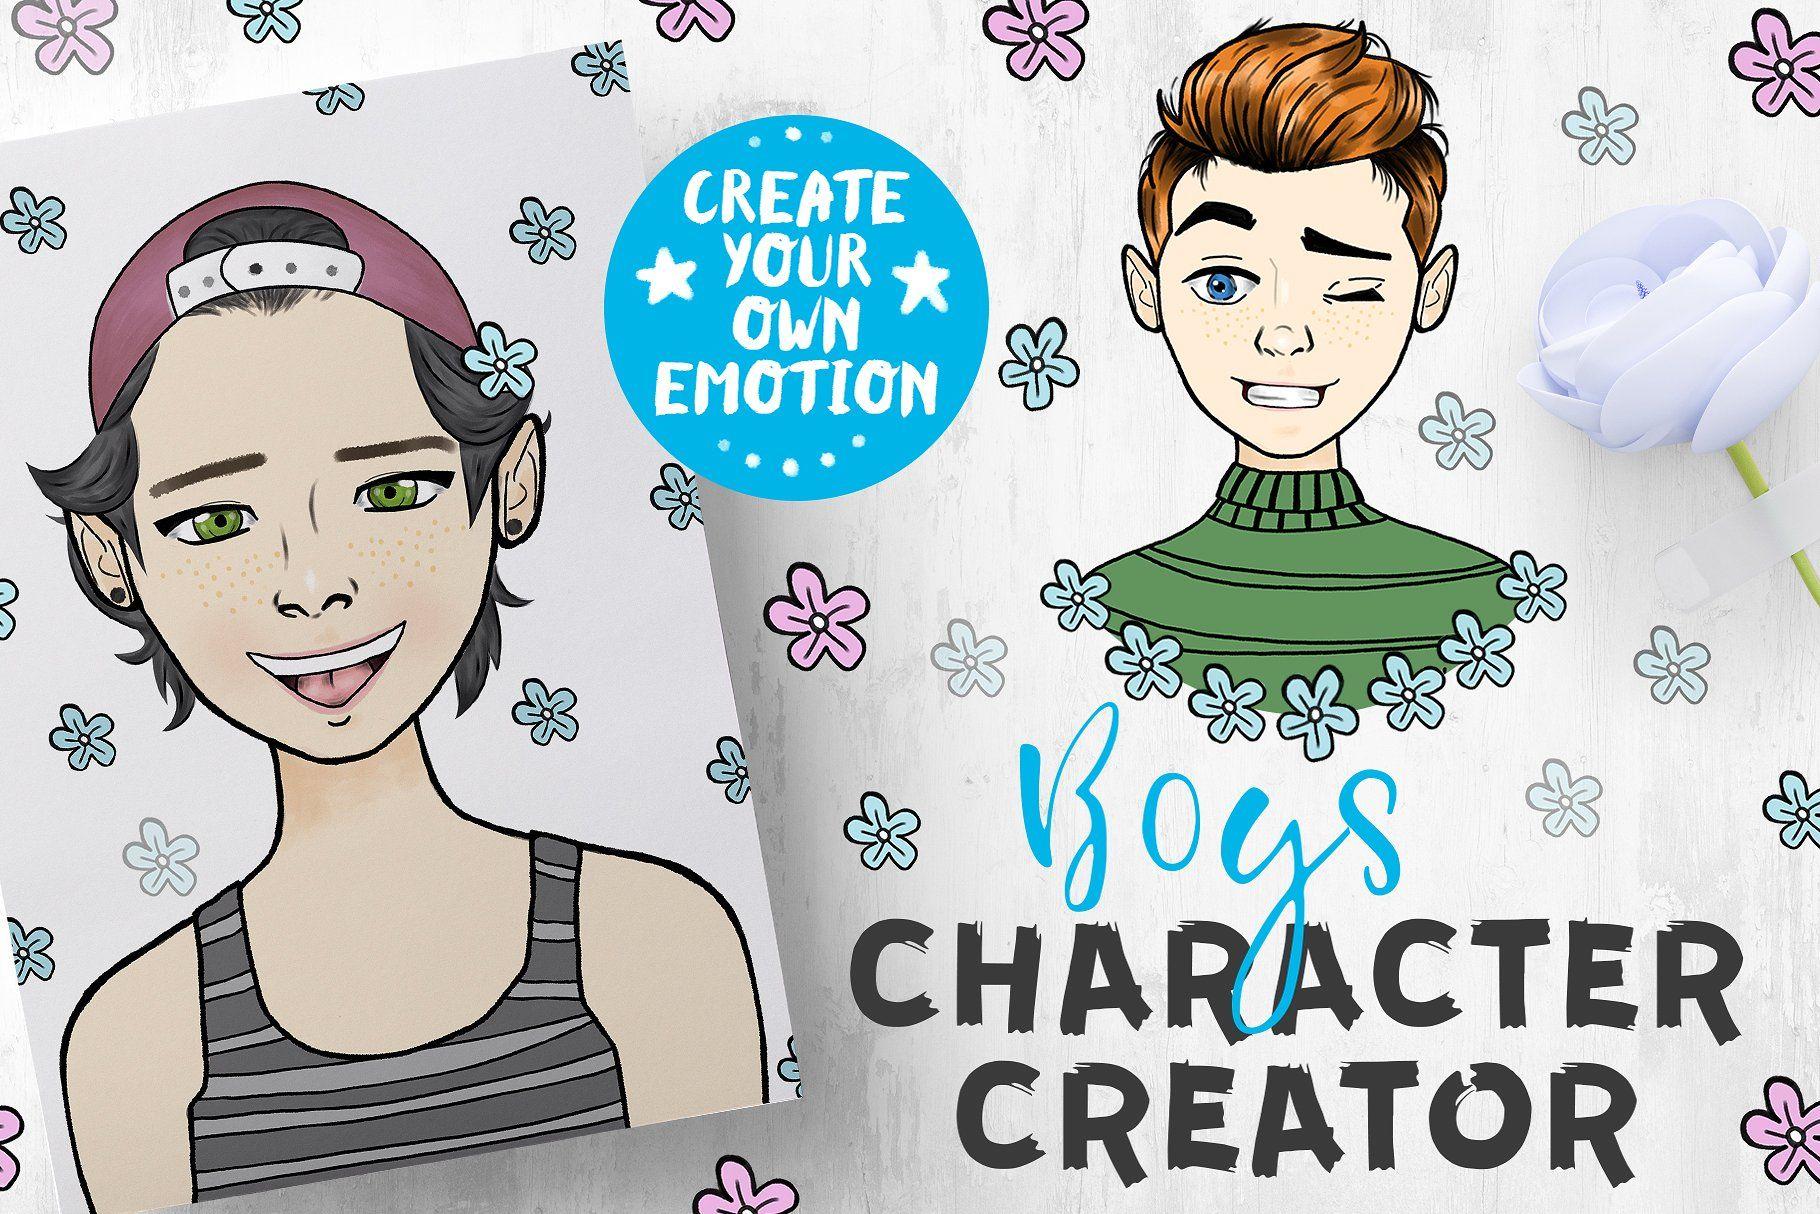 Character creator boys